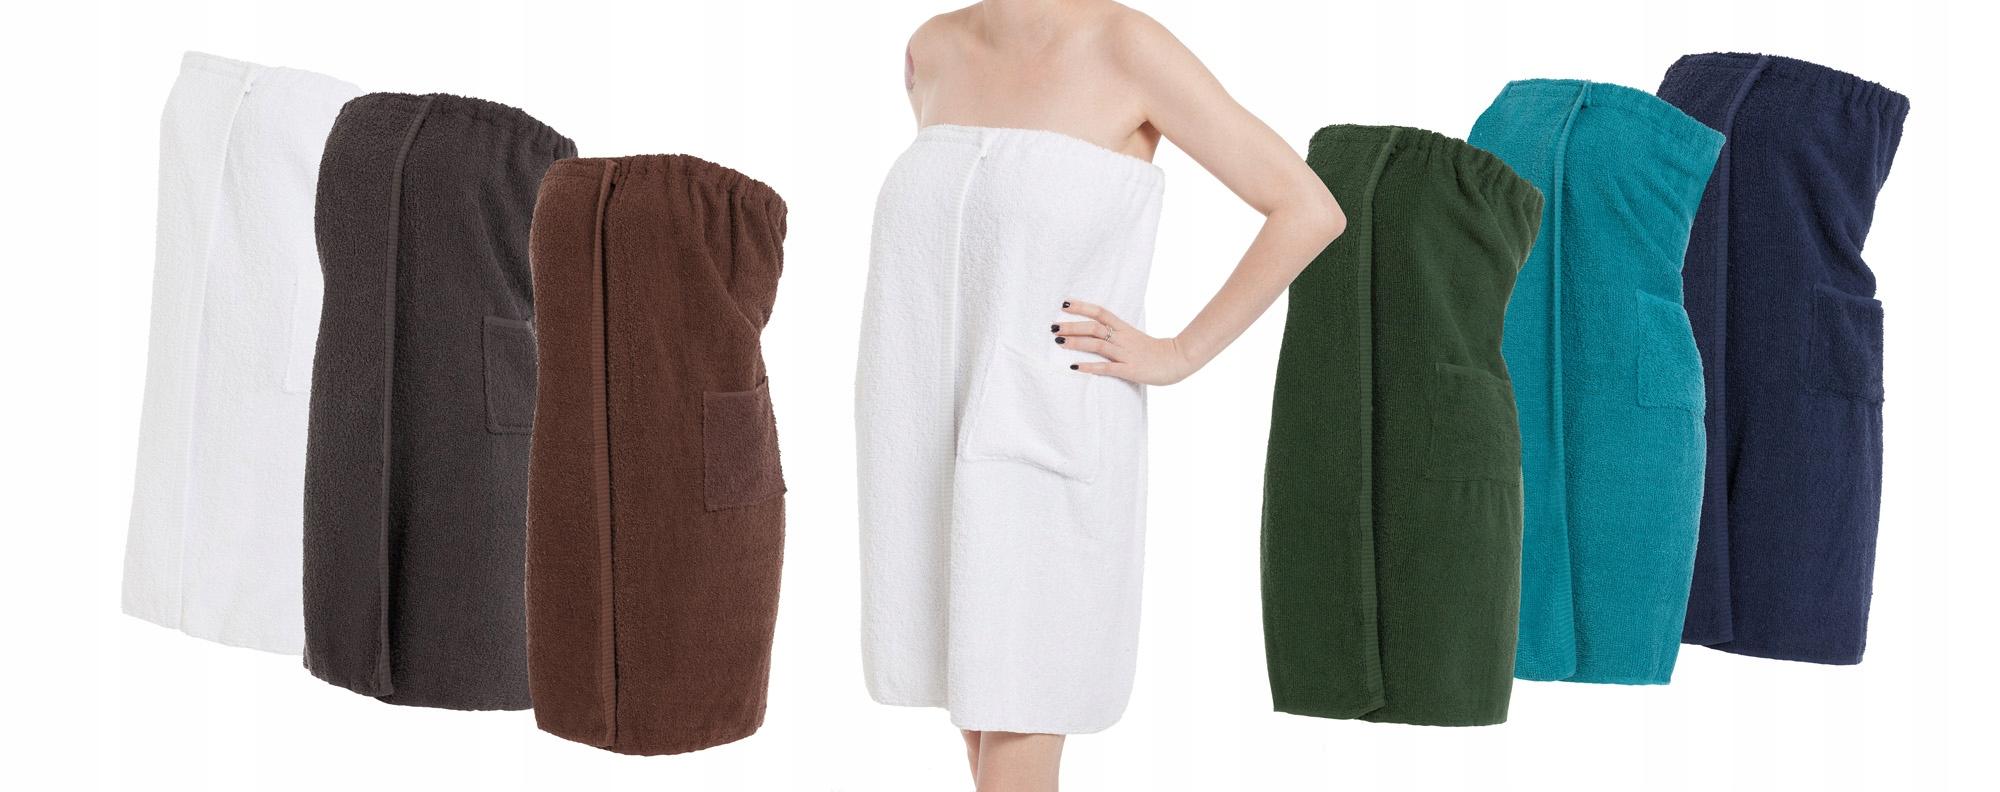 Kúpeľný bazén sauna uterák 100% bavlna 50/70 * 140 400g